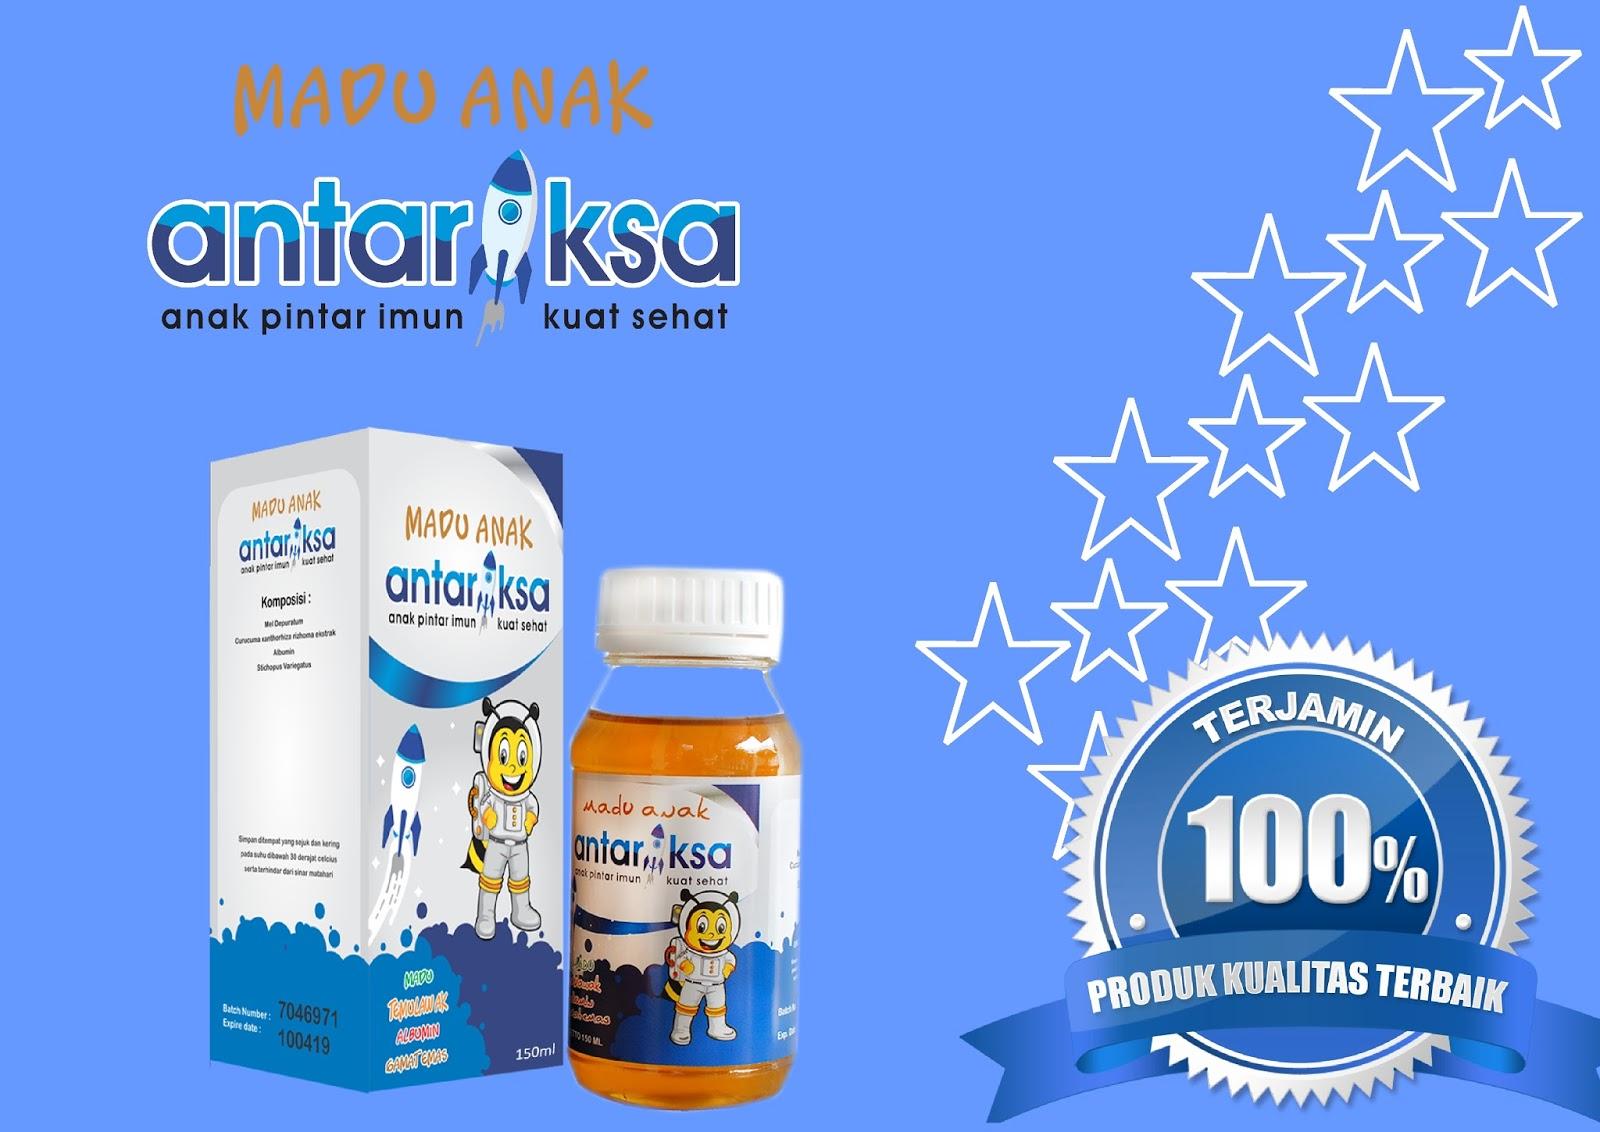 Vitamin Anak Madu Antariksa Latar Belakang Biru